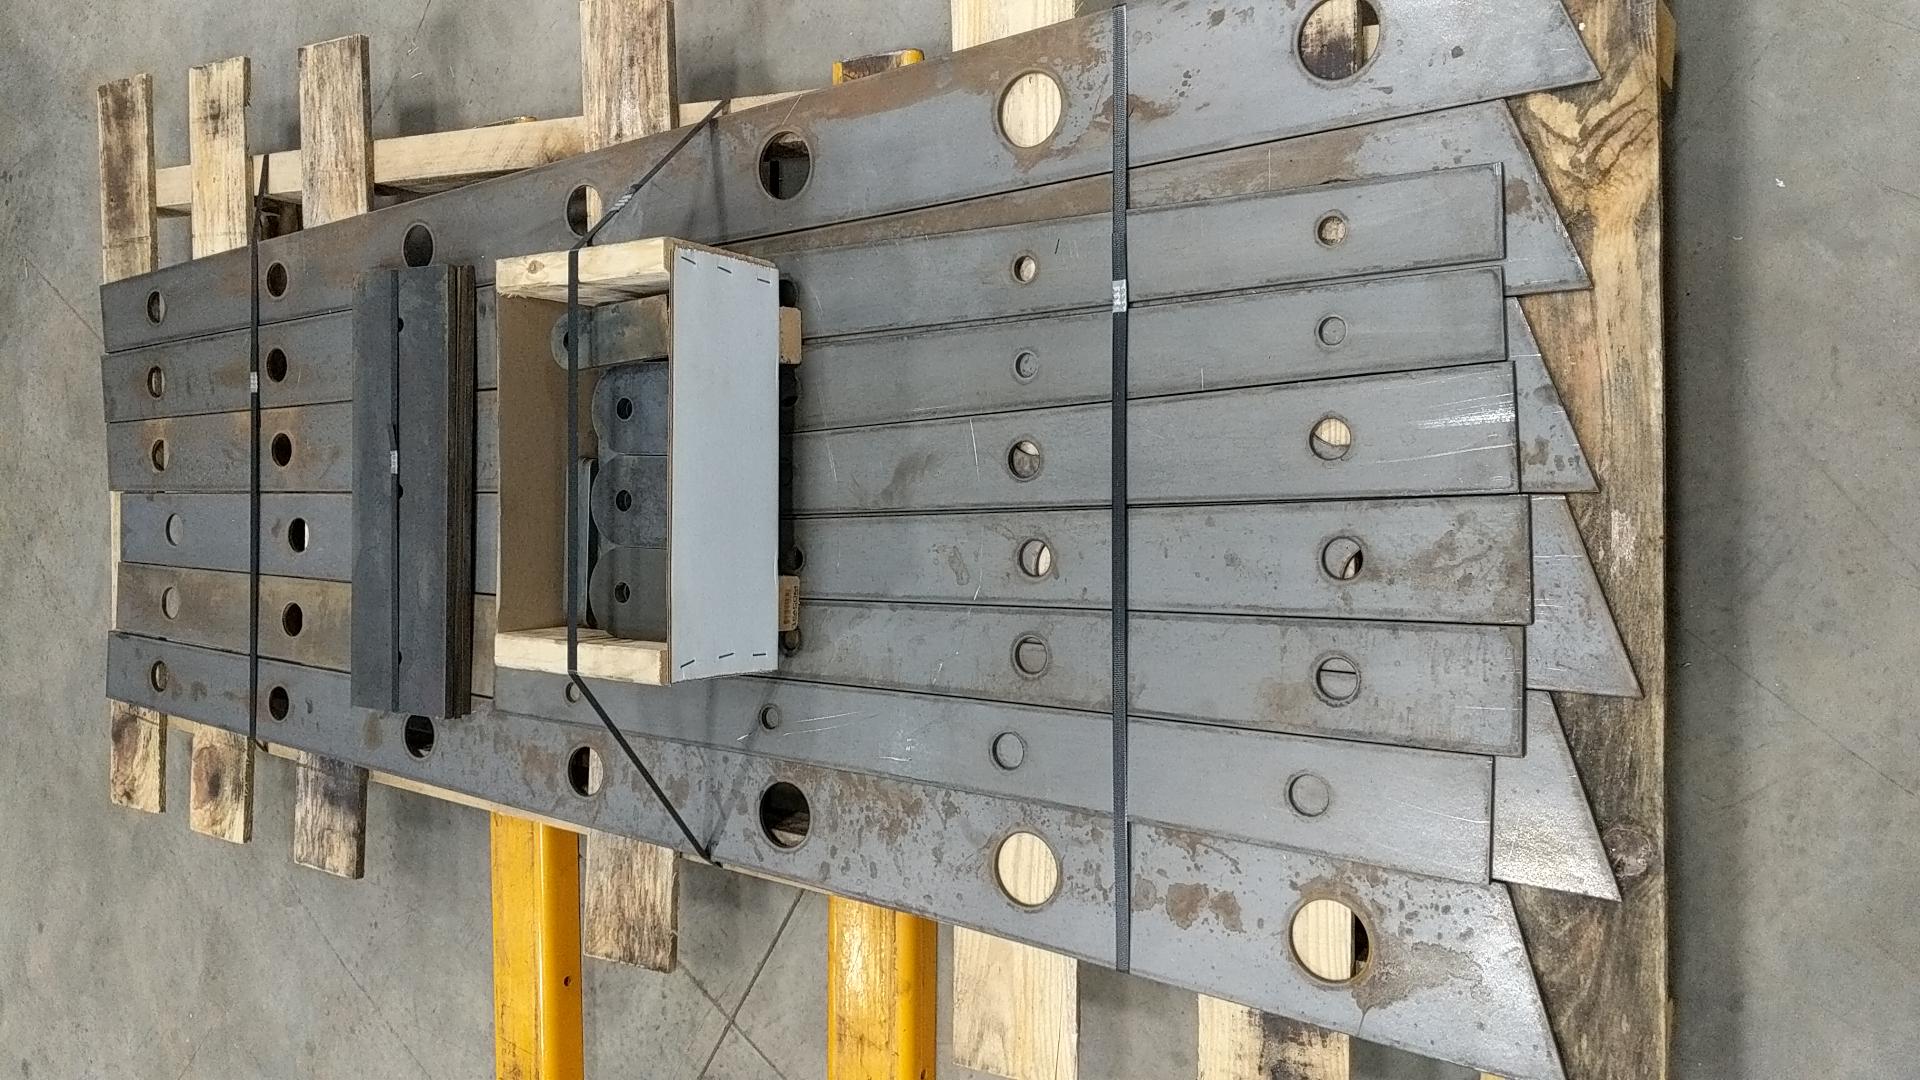 CNC cut components for commercial